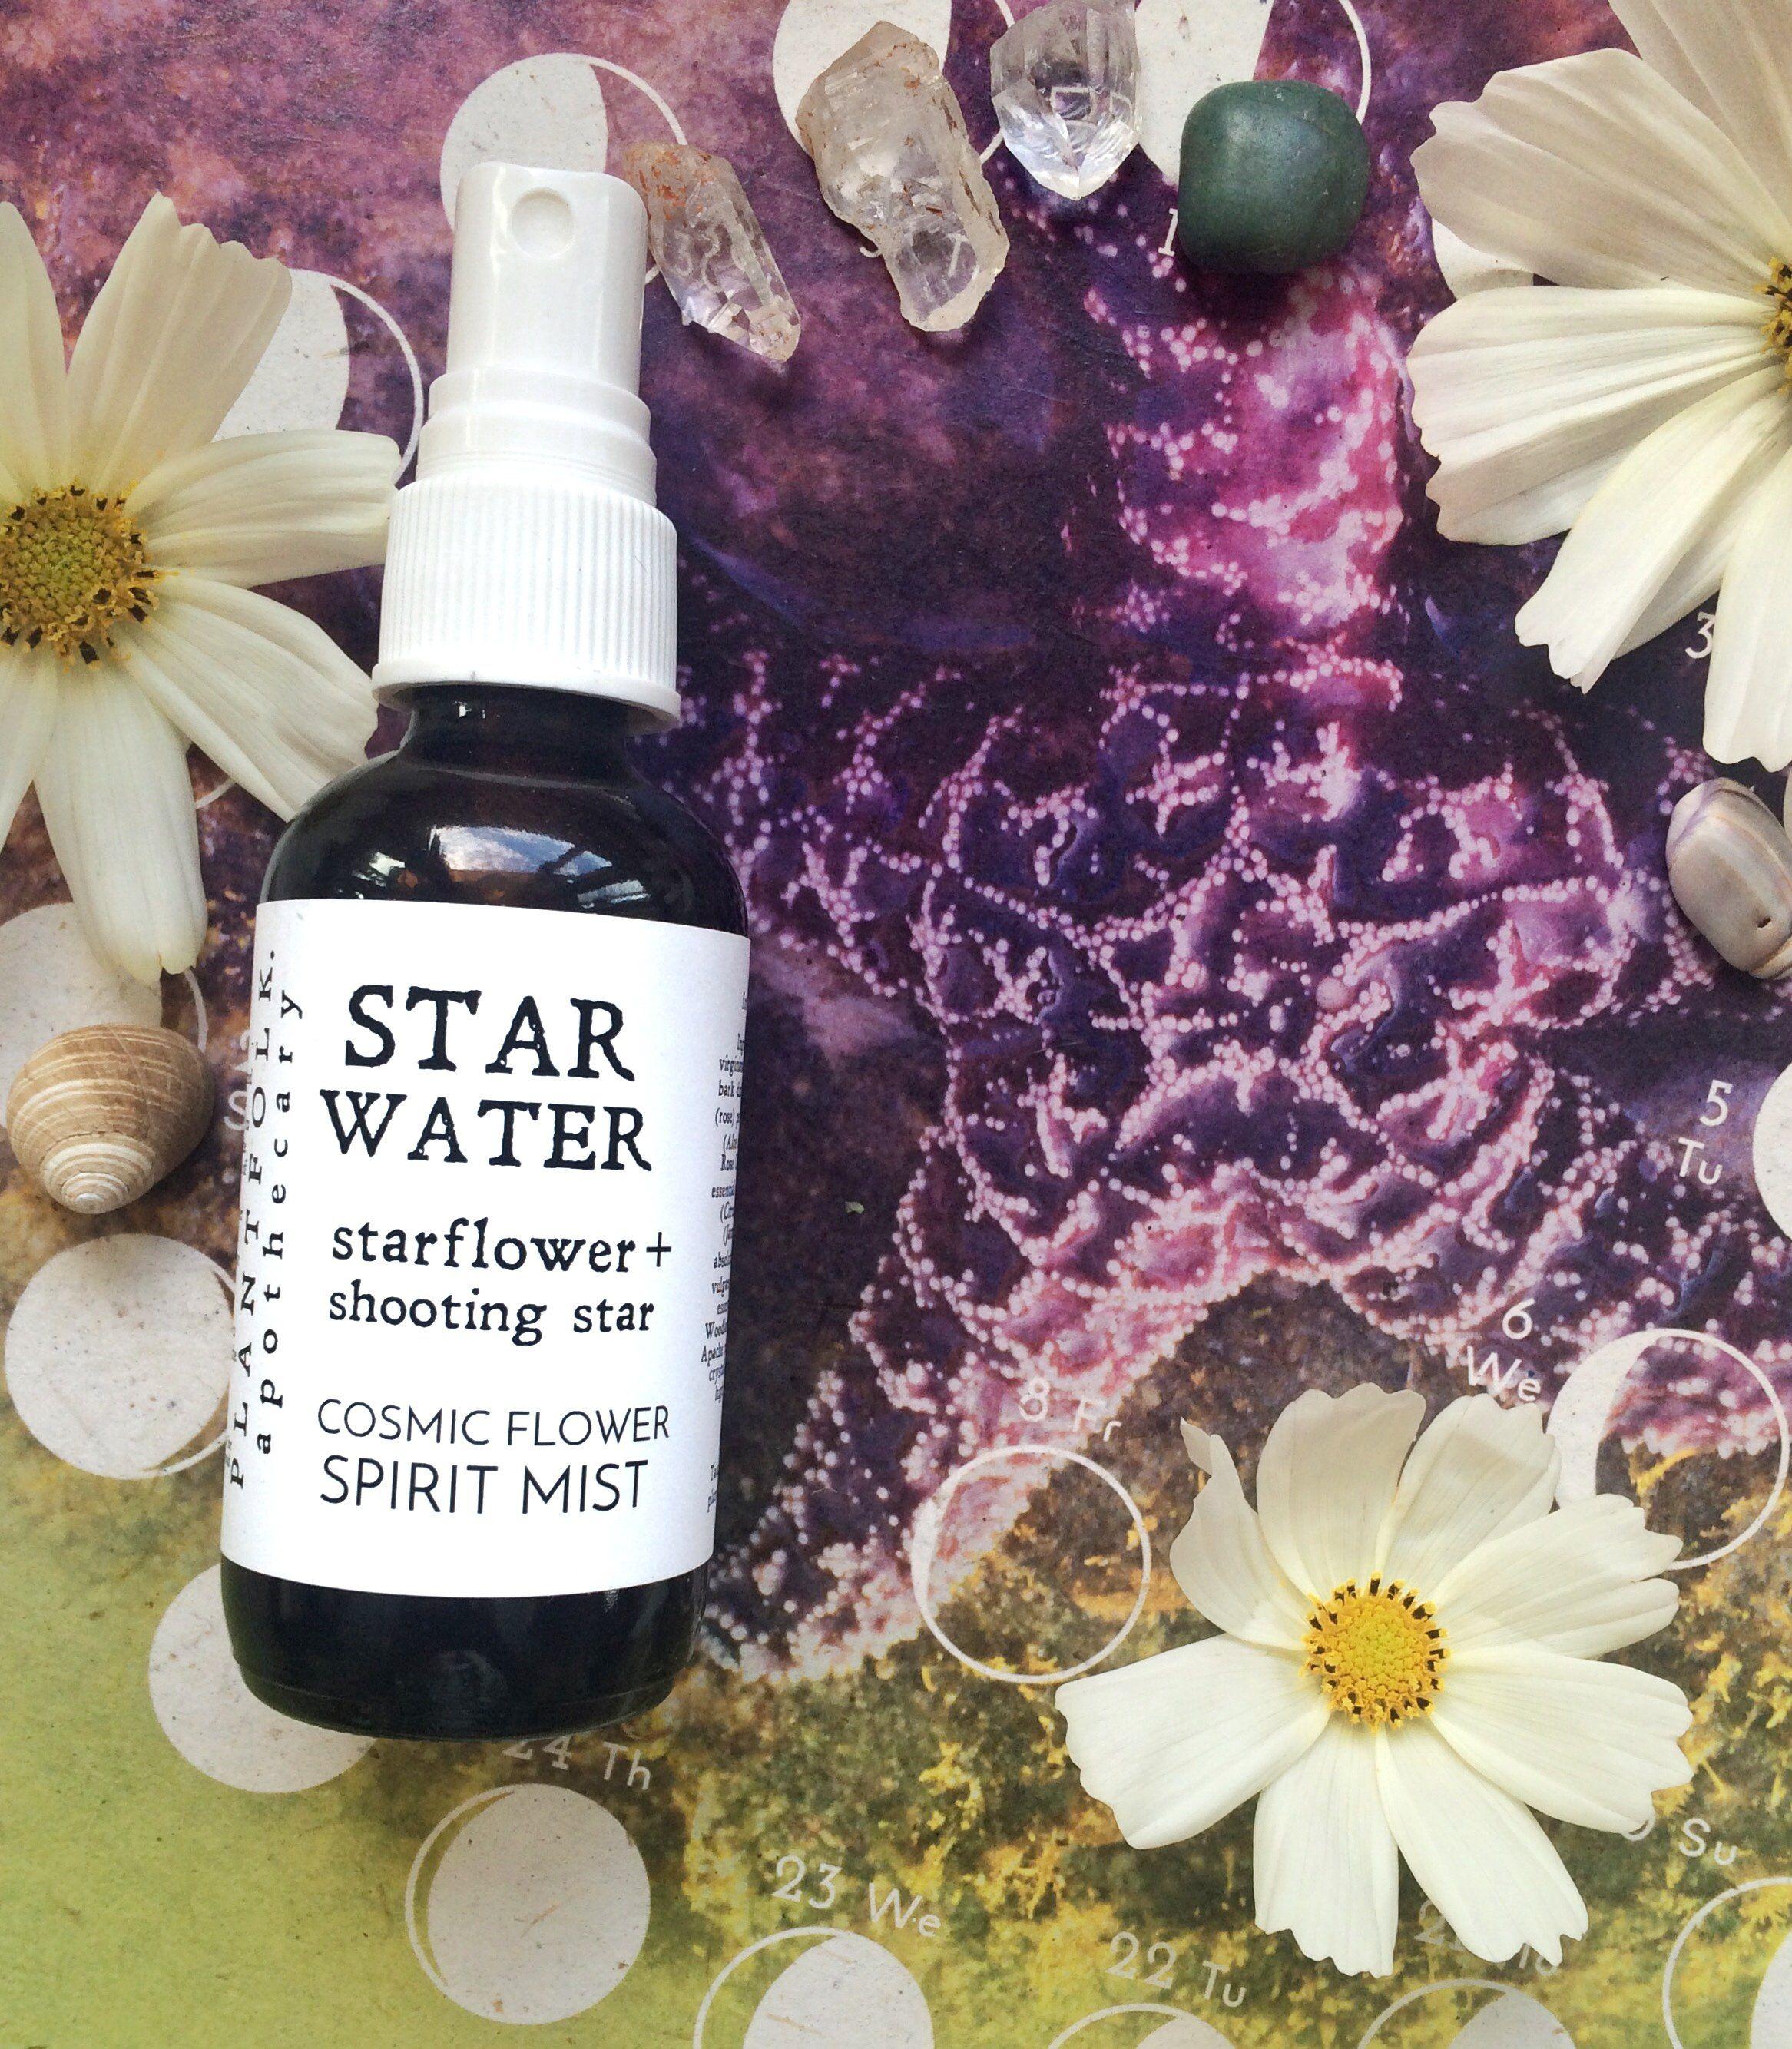 Star Water Starflower Shooting Star Spirit Mist Mists Flower Essences Shooting Stars